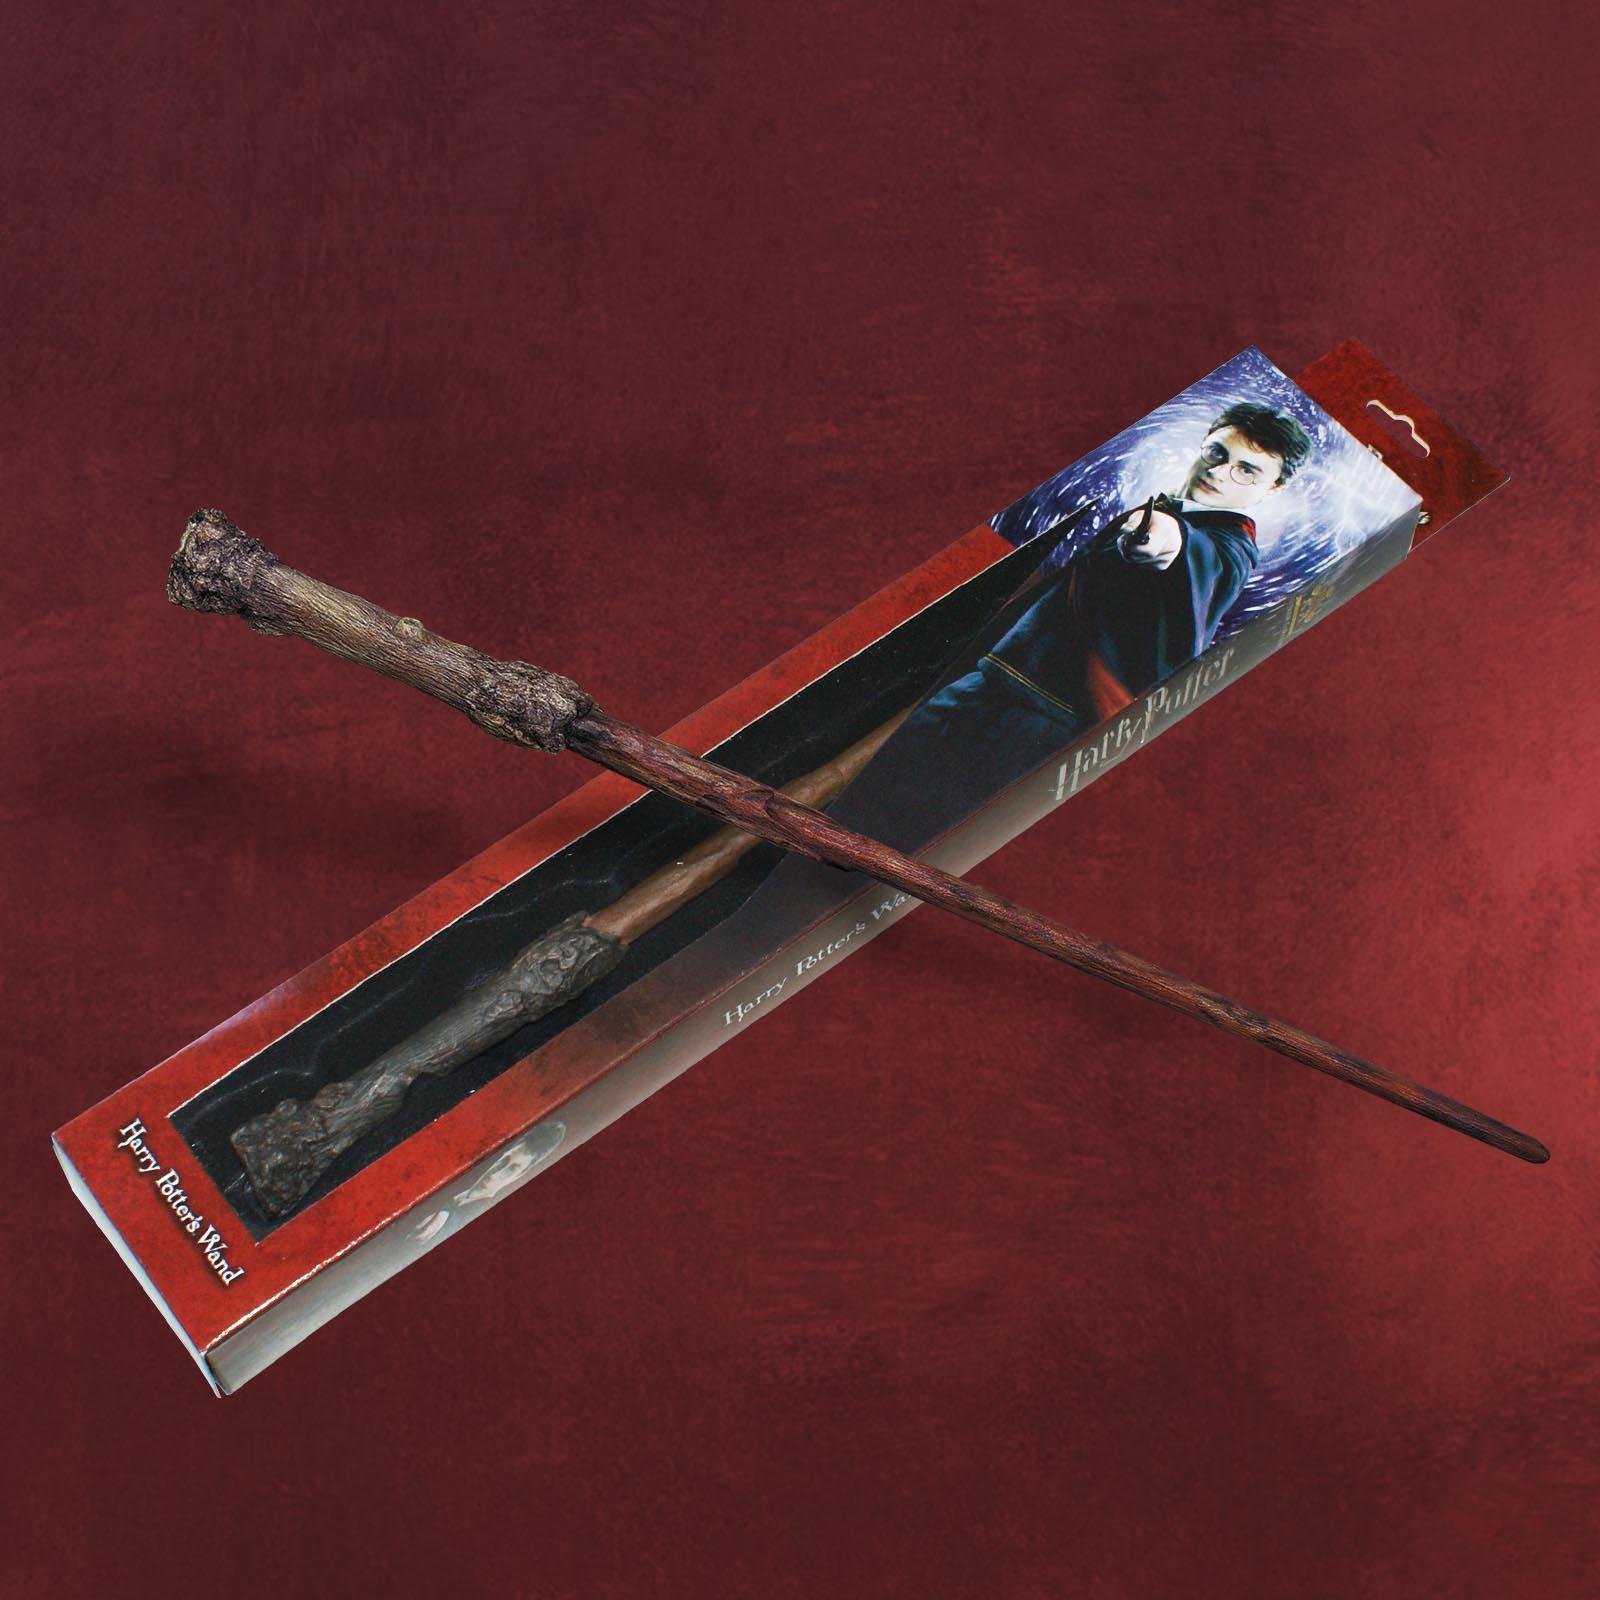 Harry Potter Zauberstab im Blister  Elbenwald